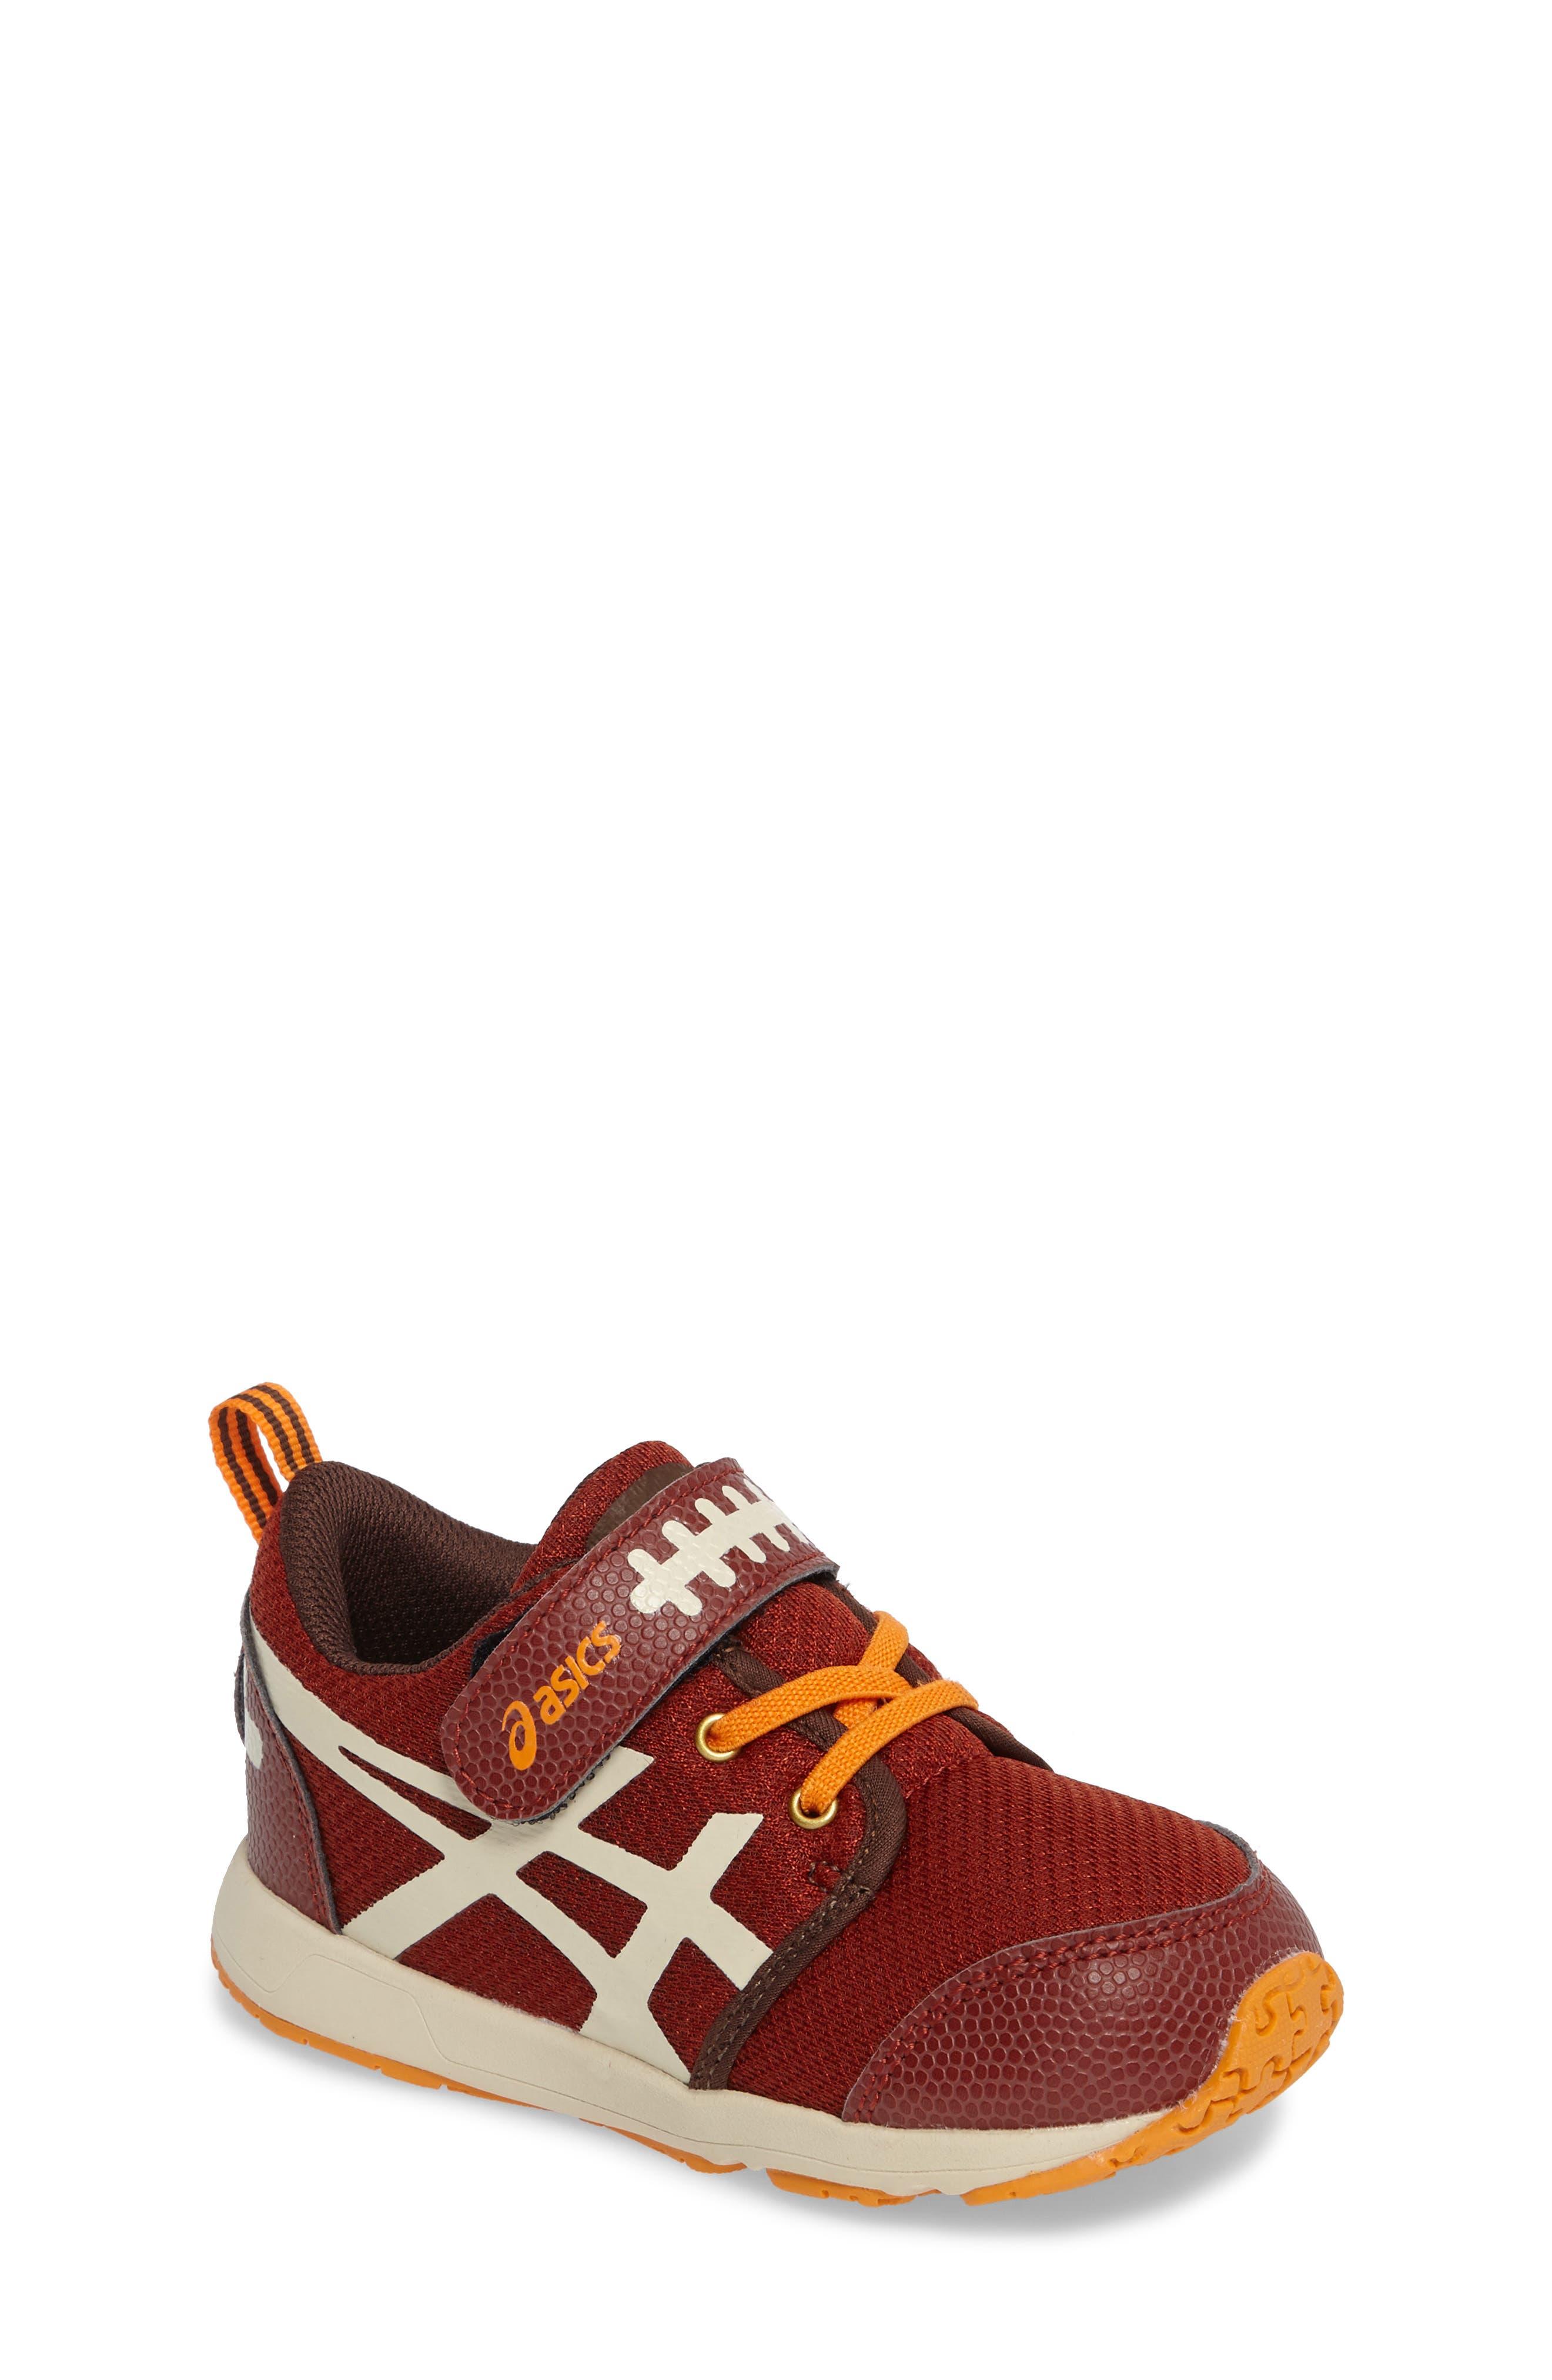 Alternate Image 1 Selected - ASICS® School Yard™ TS Sneaker (Baby, Walker & Toddler)